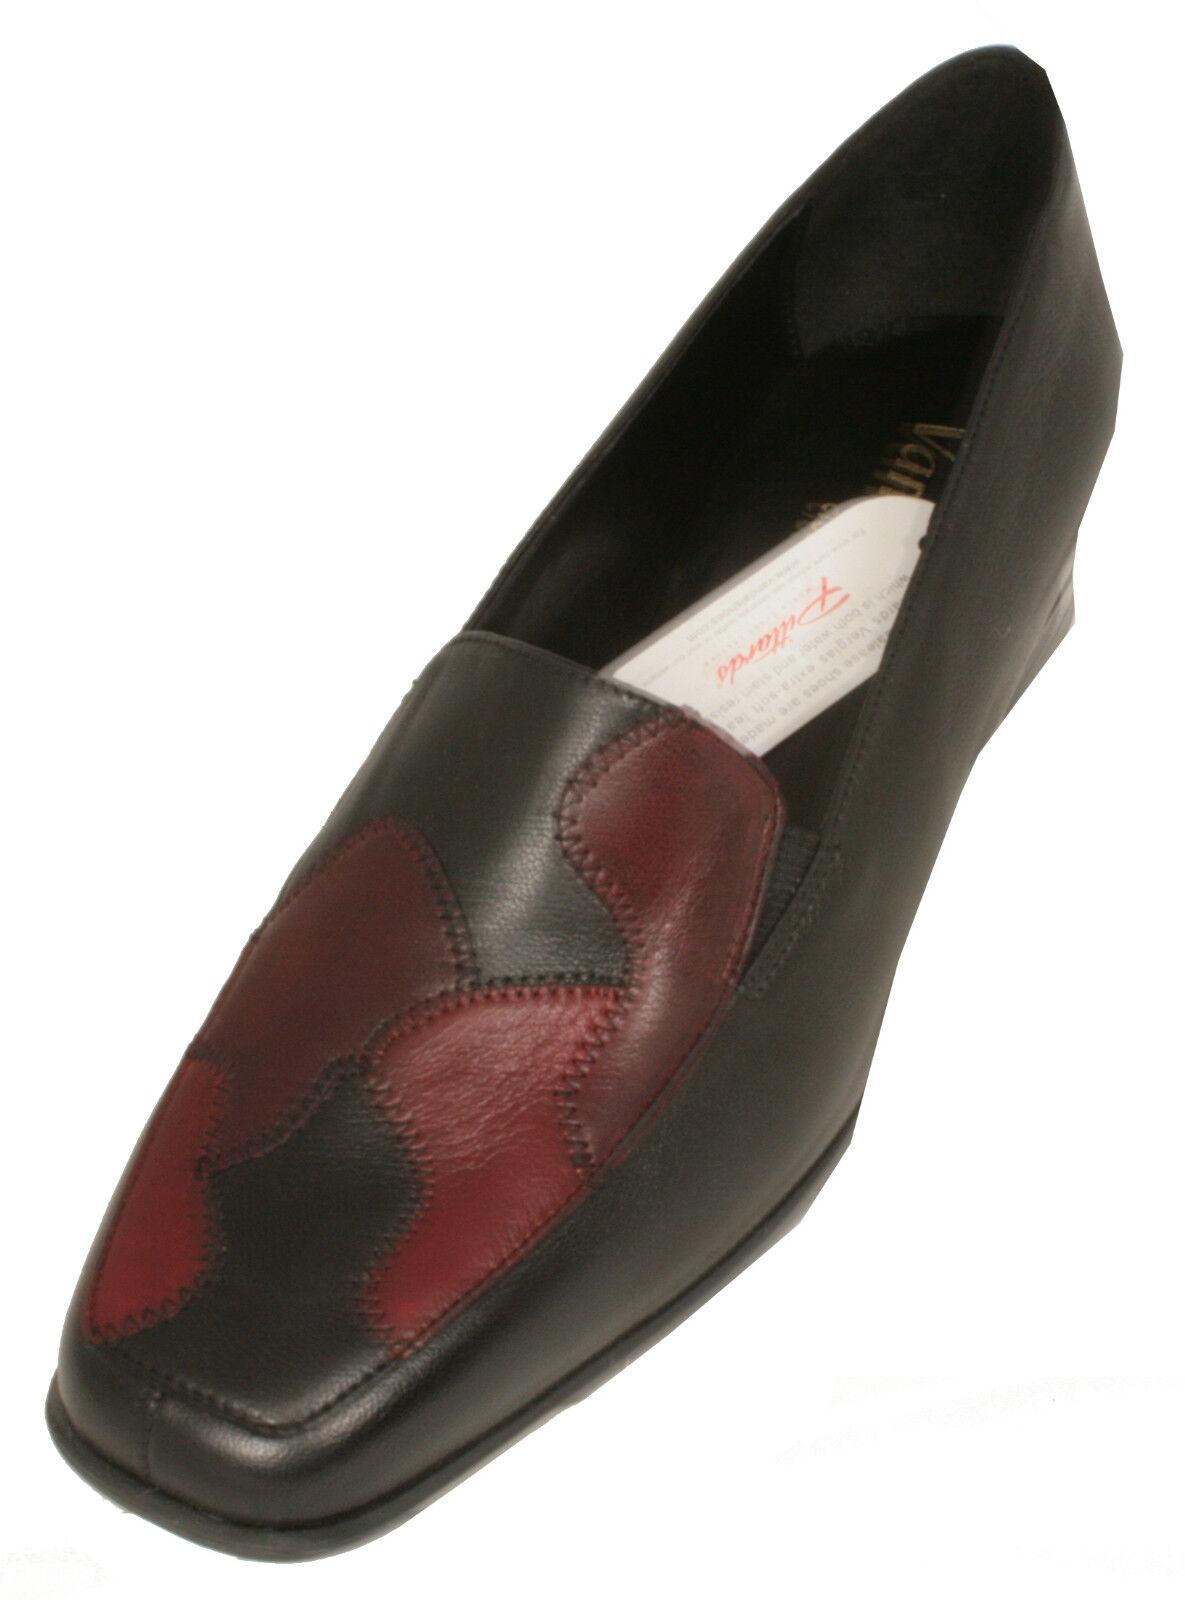 Zapatos señoras de paso en Van Dal Culross Culross Culross en Negro ABUS O Bronceado tamaño de Reino Unido 5 UE 38  deportes calientes